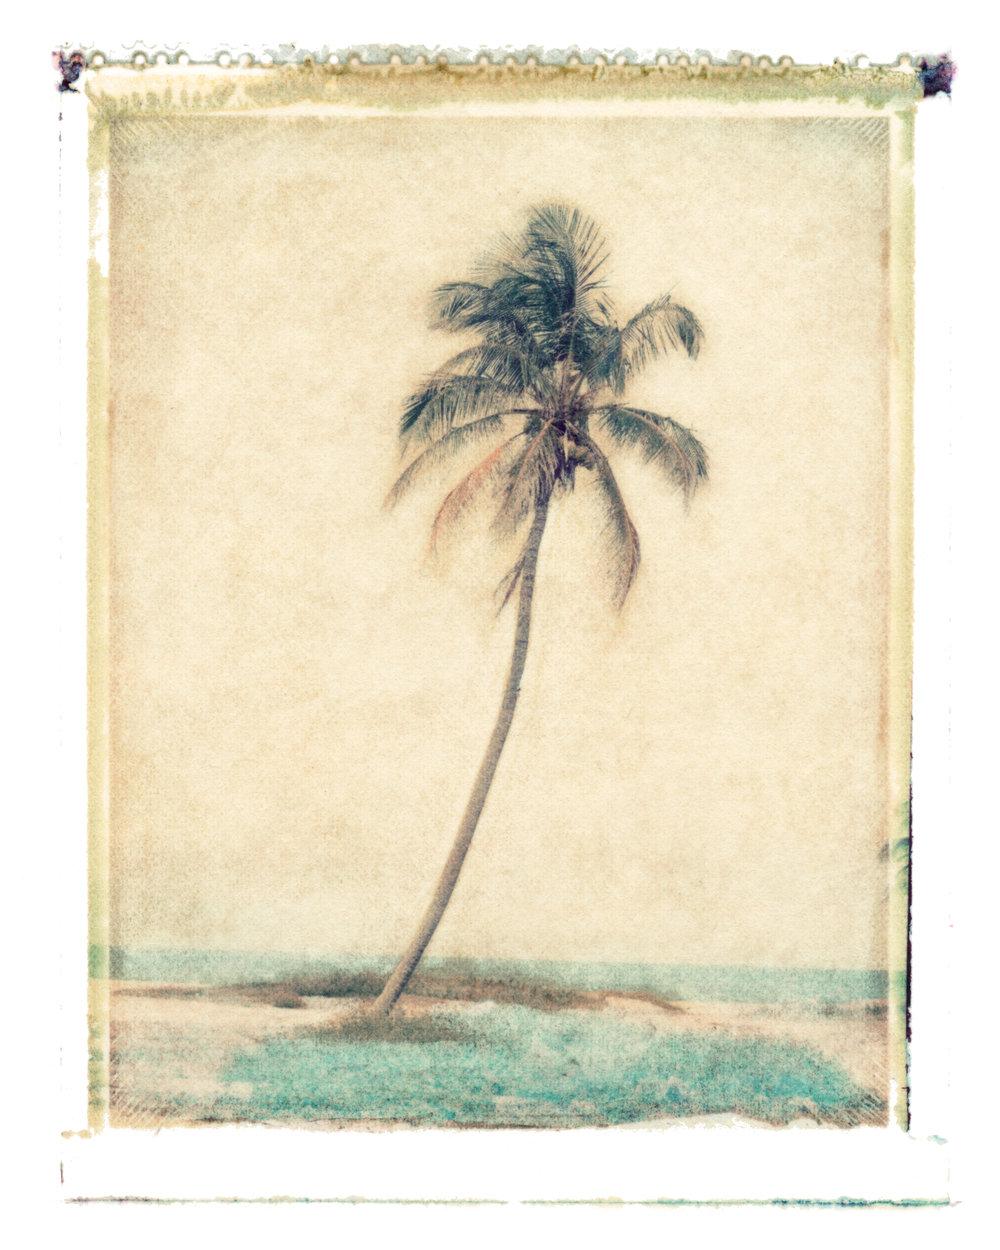 Cocos nucifera  Pompano Beach, Florida, 1995